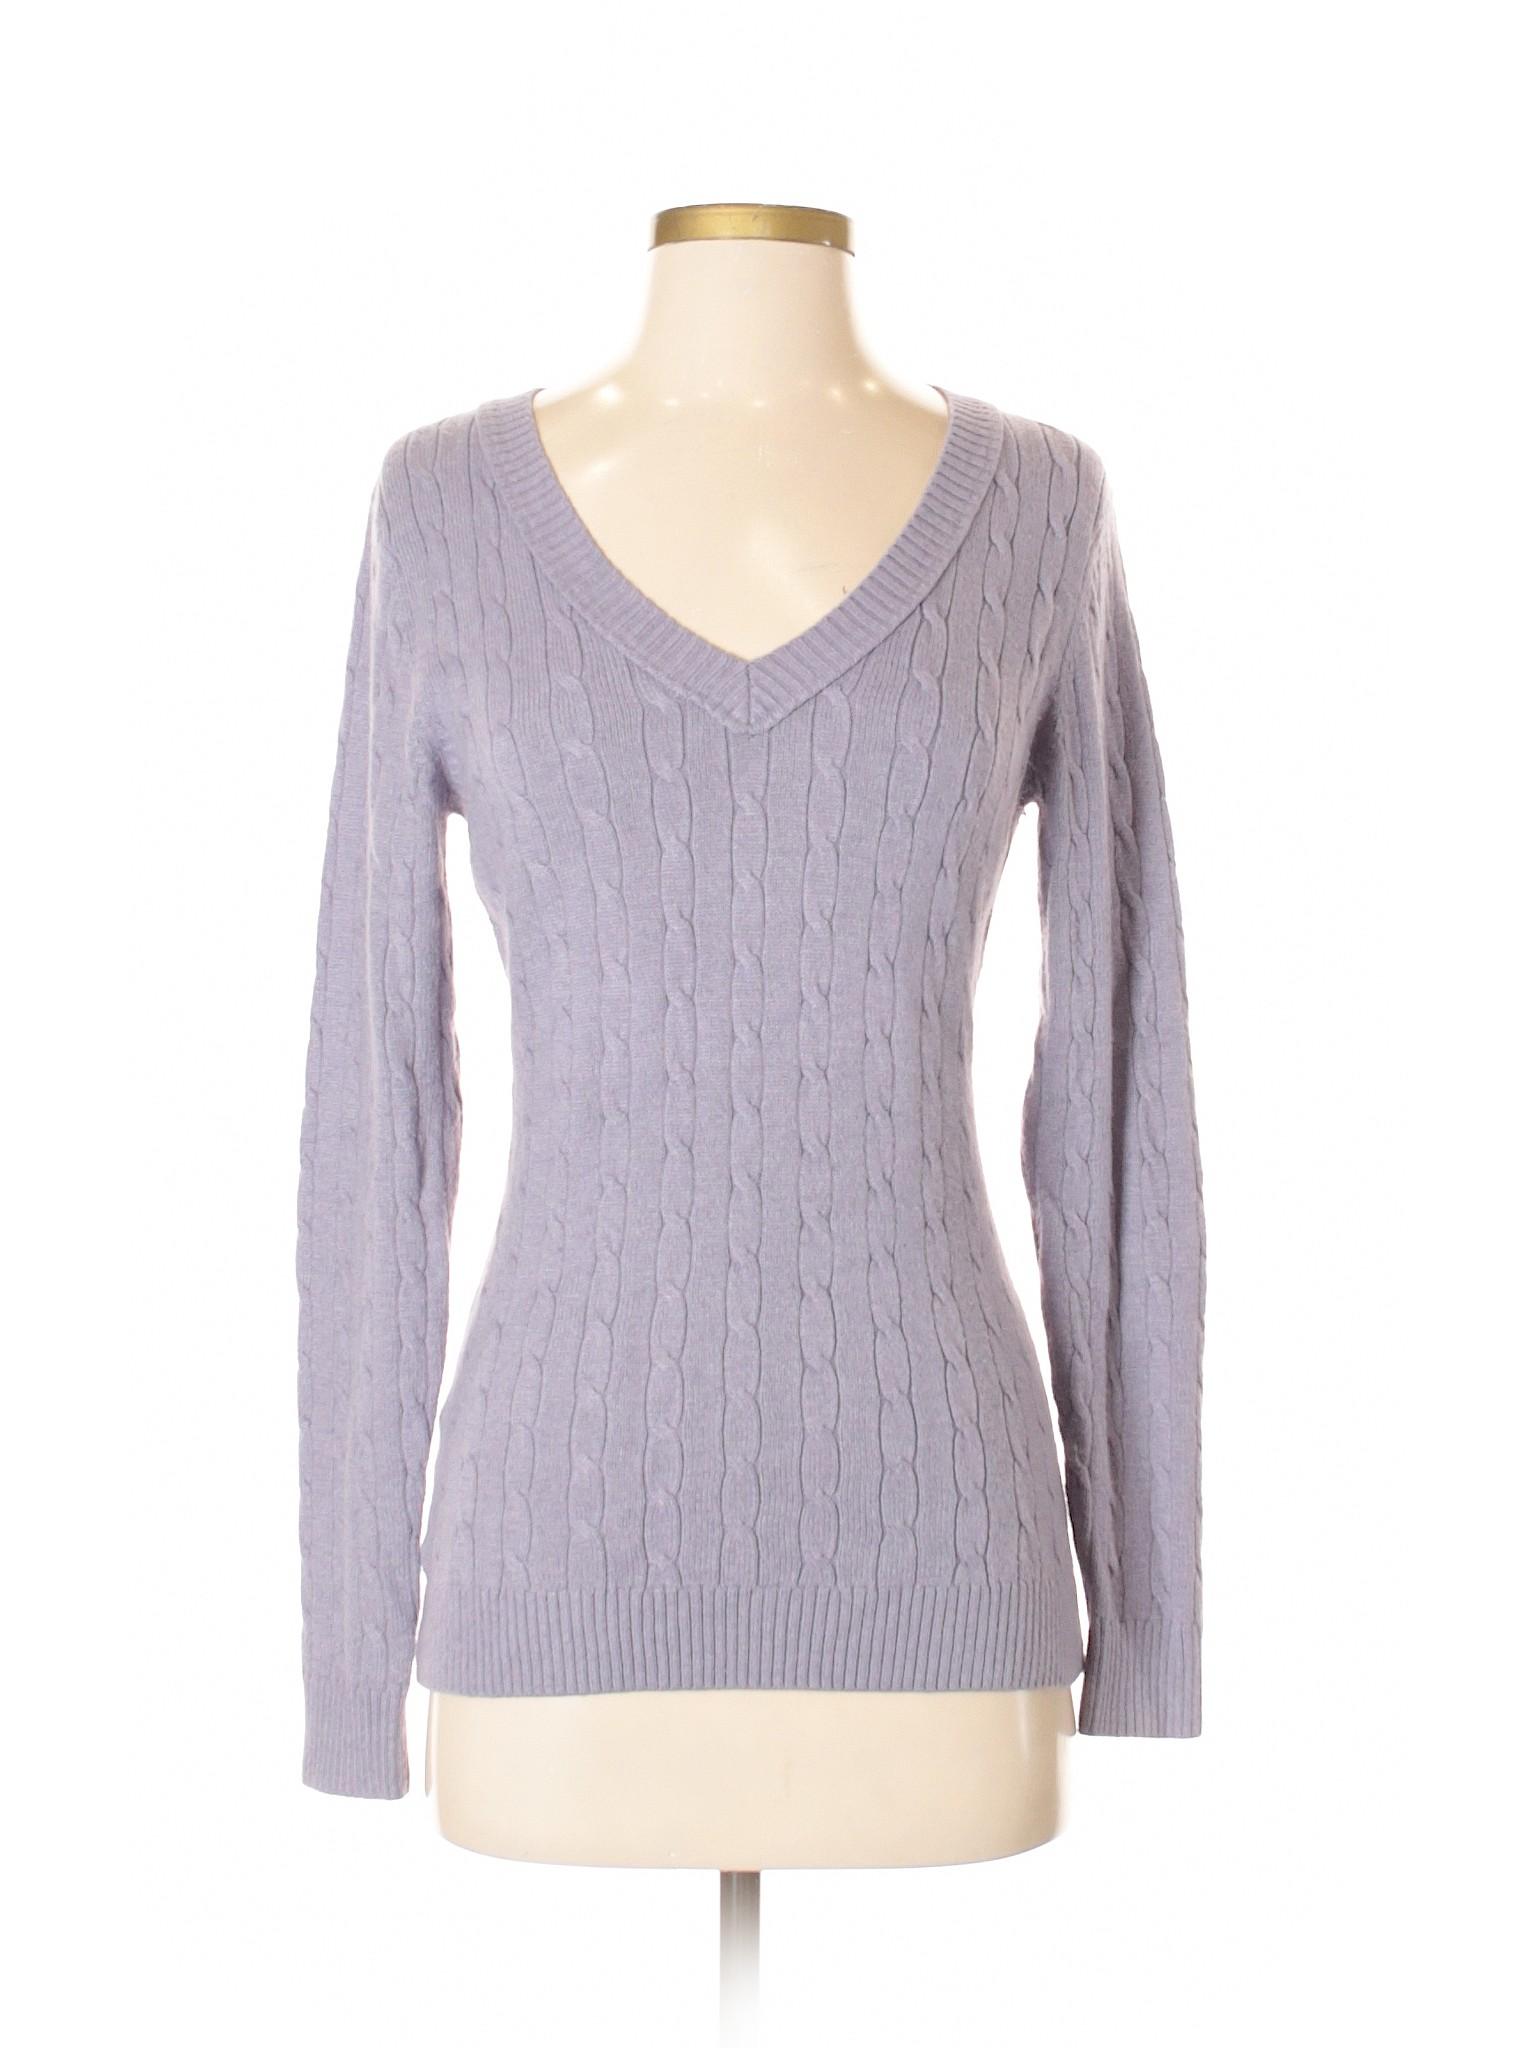 winter LOFT Ann Pullover Sweater Boutique Taylor 6wC8q8vO